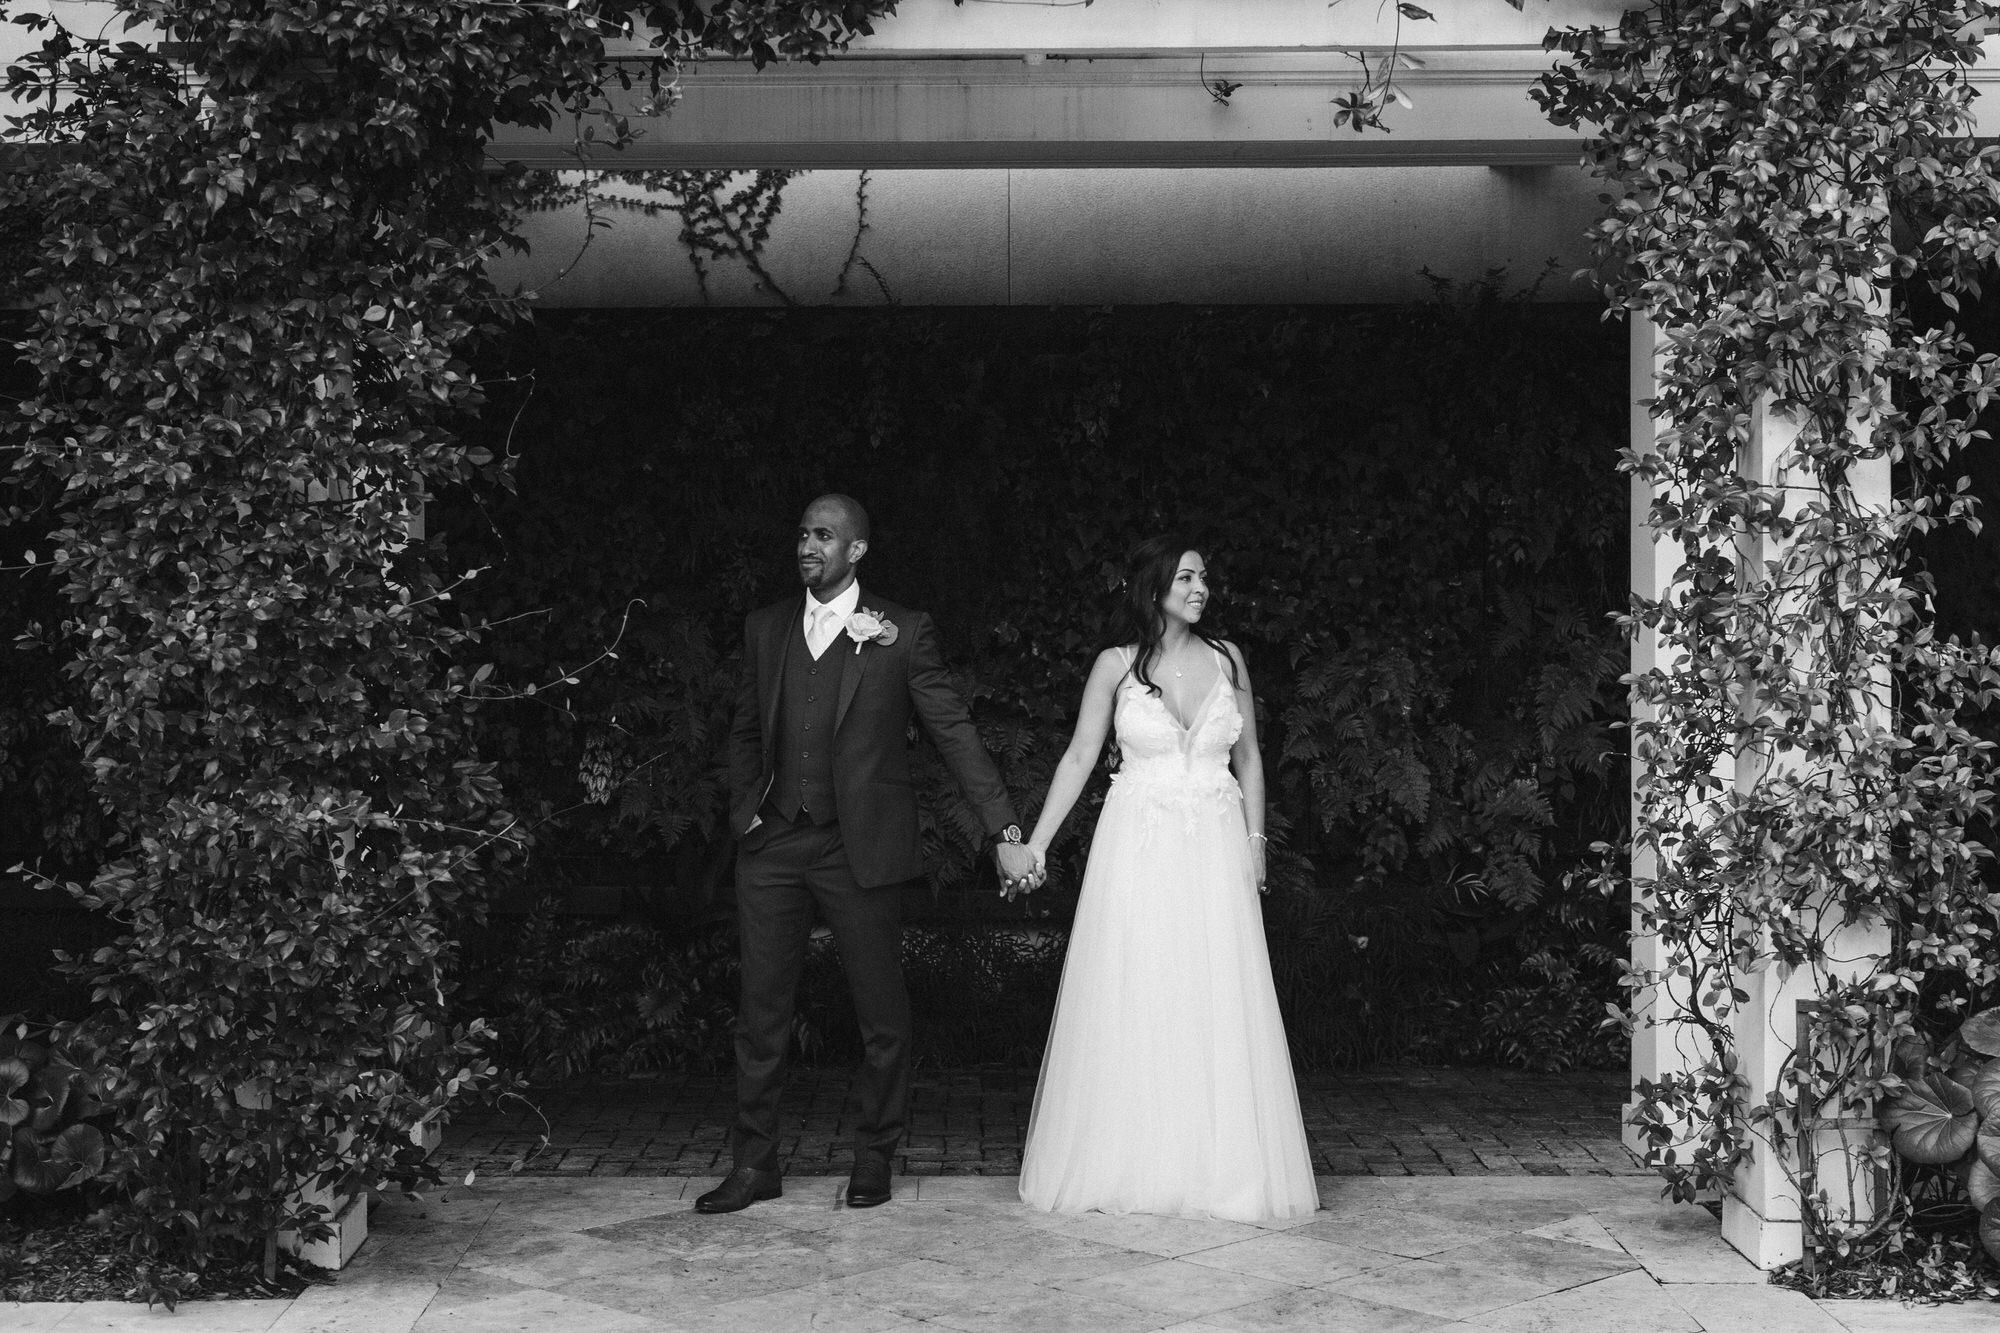 st-lukes-chapel-cannon-green-charleston-wedding-986.JPG